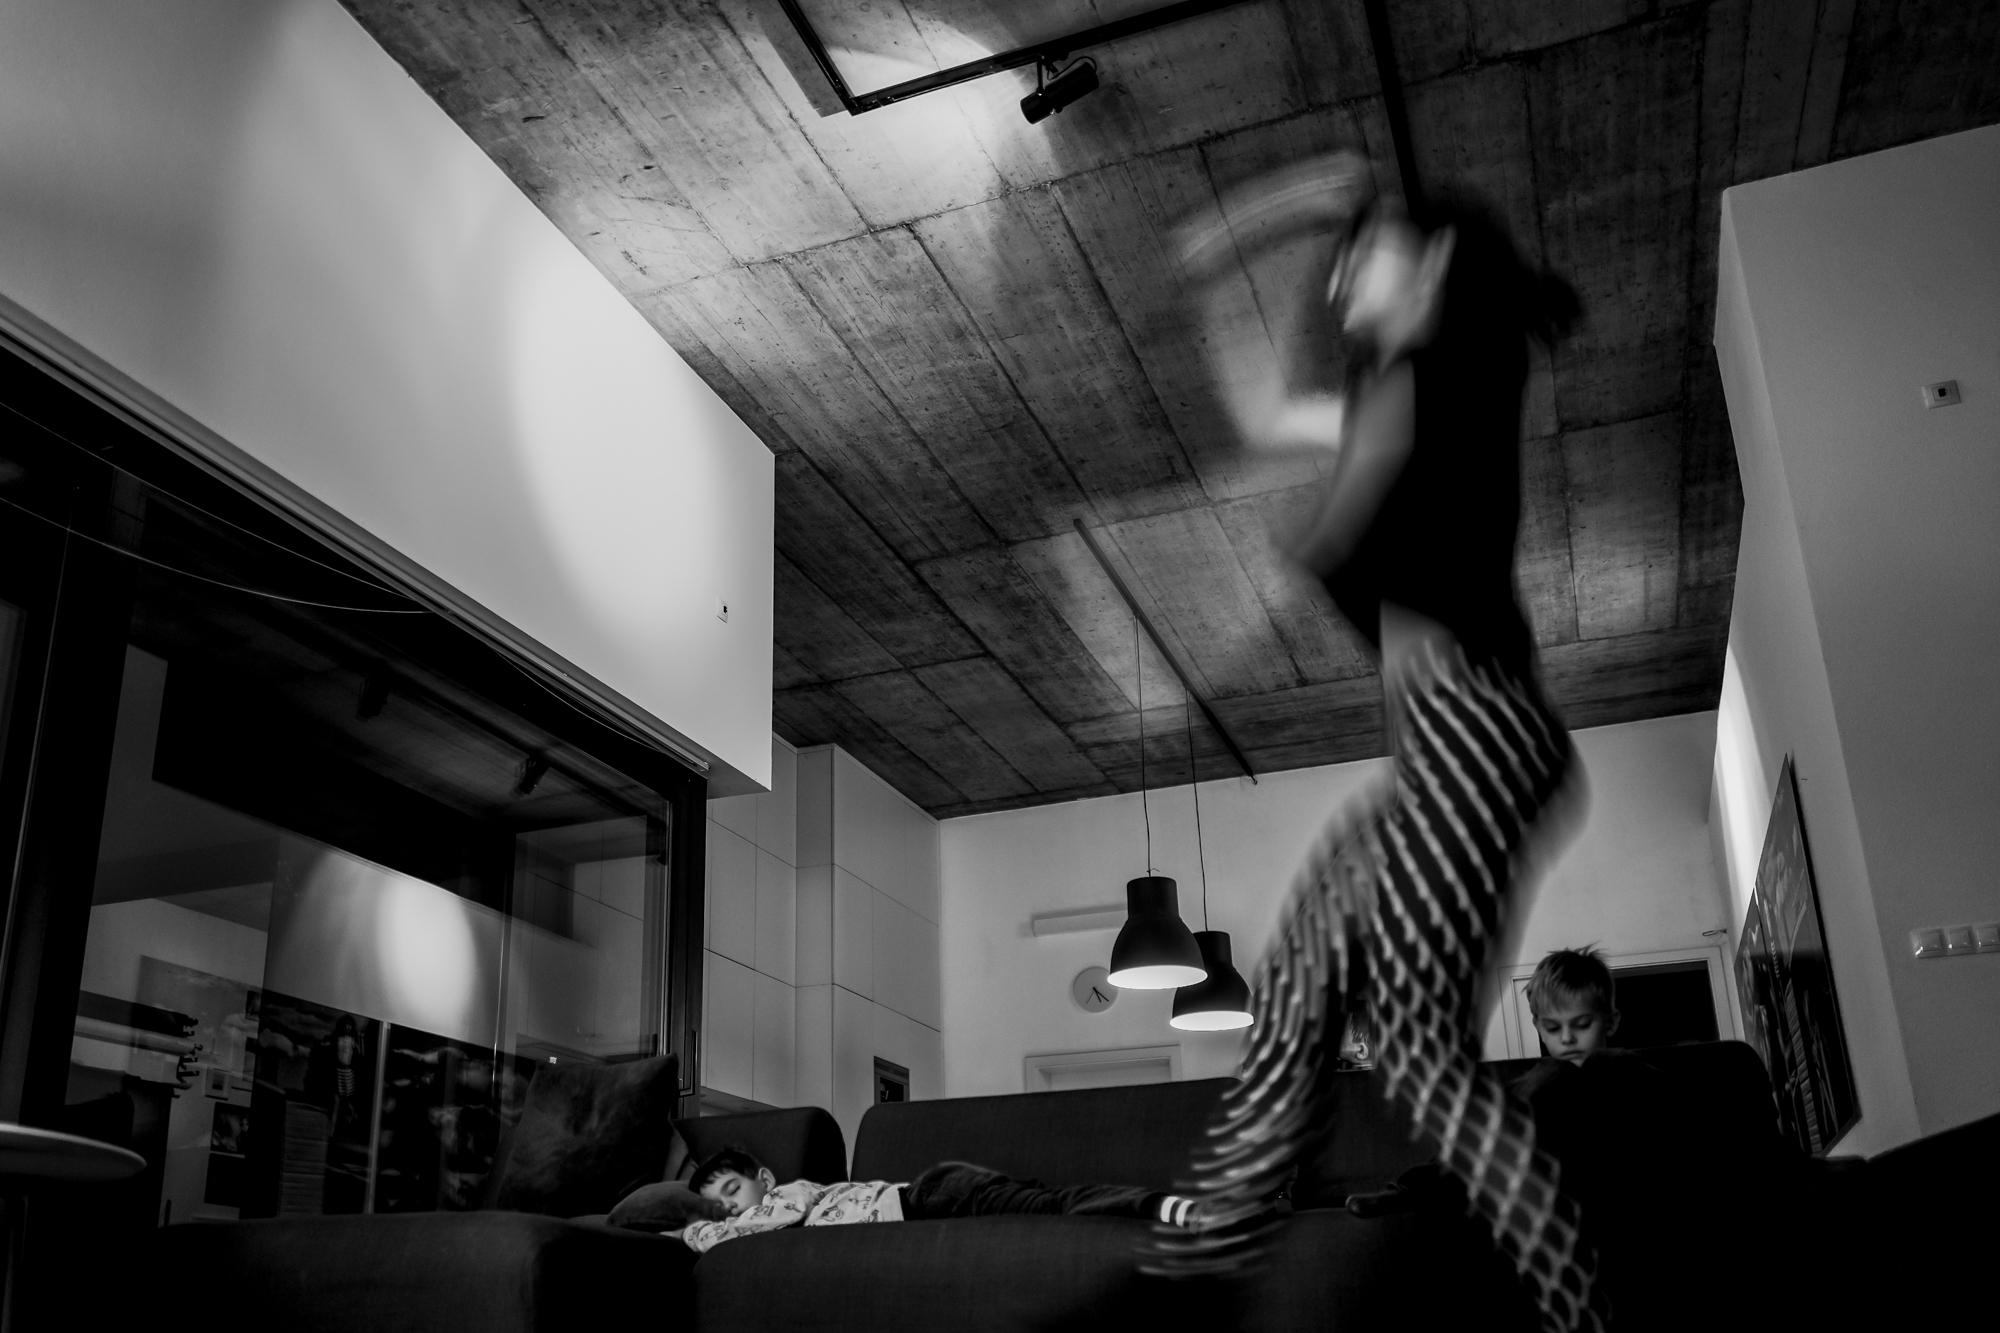 katasedlak, ellophotography, photography - katasedlak | ello